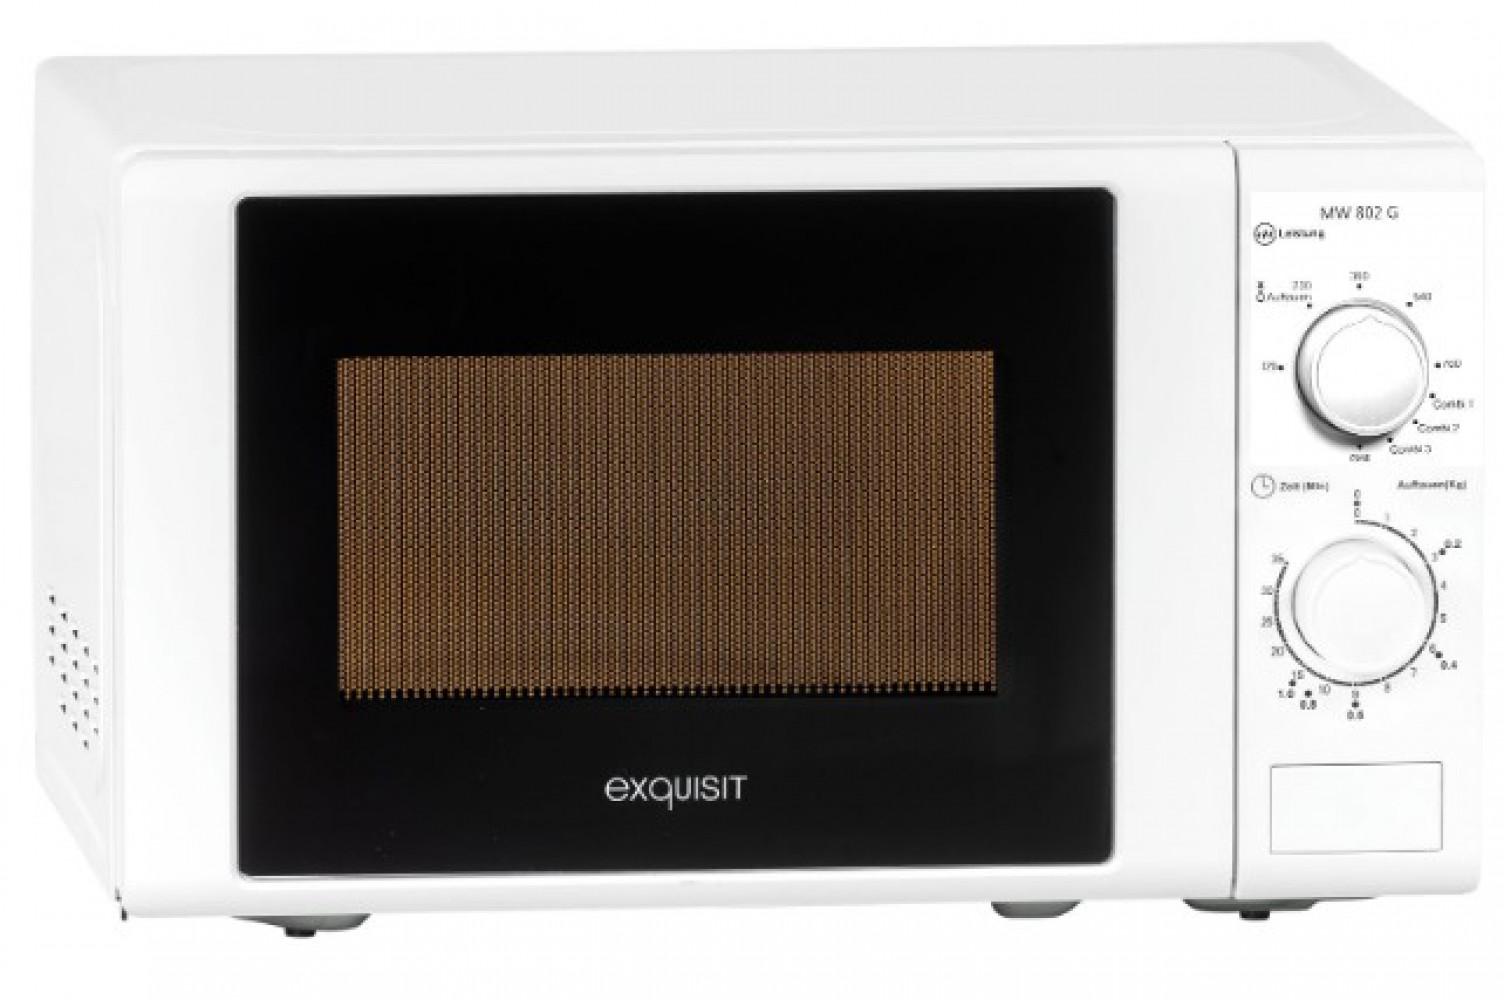 MW802G Micro-ondes blanc